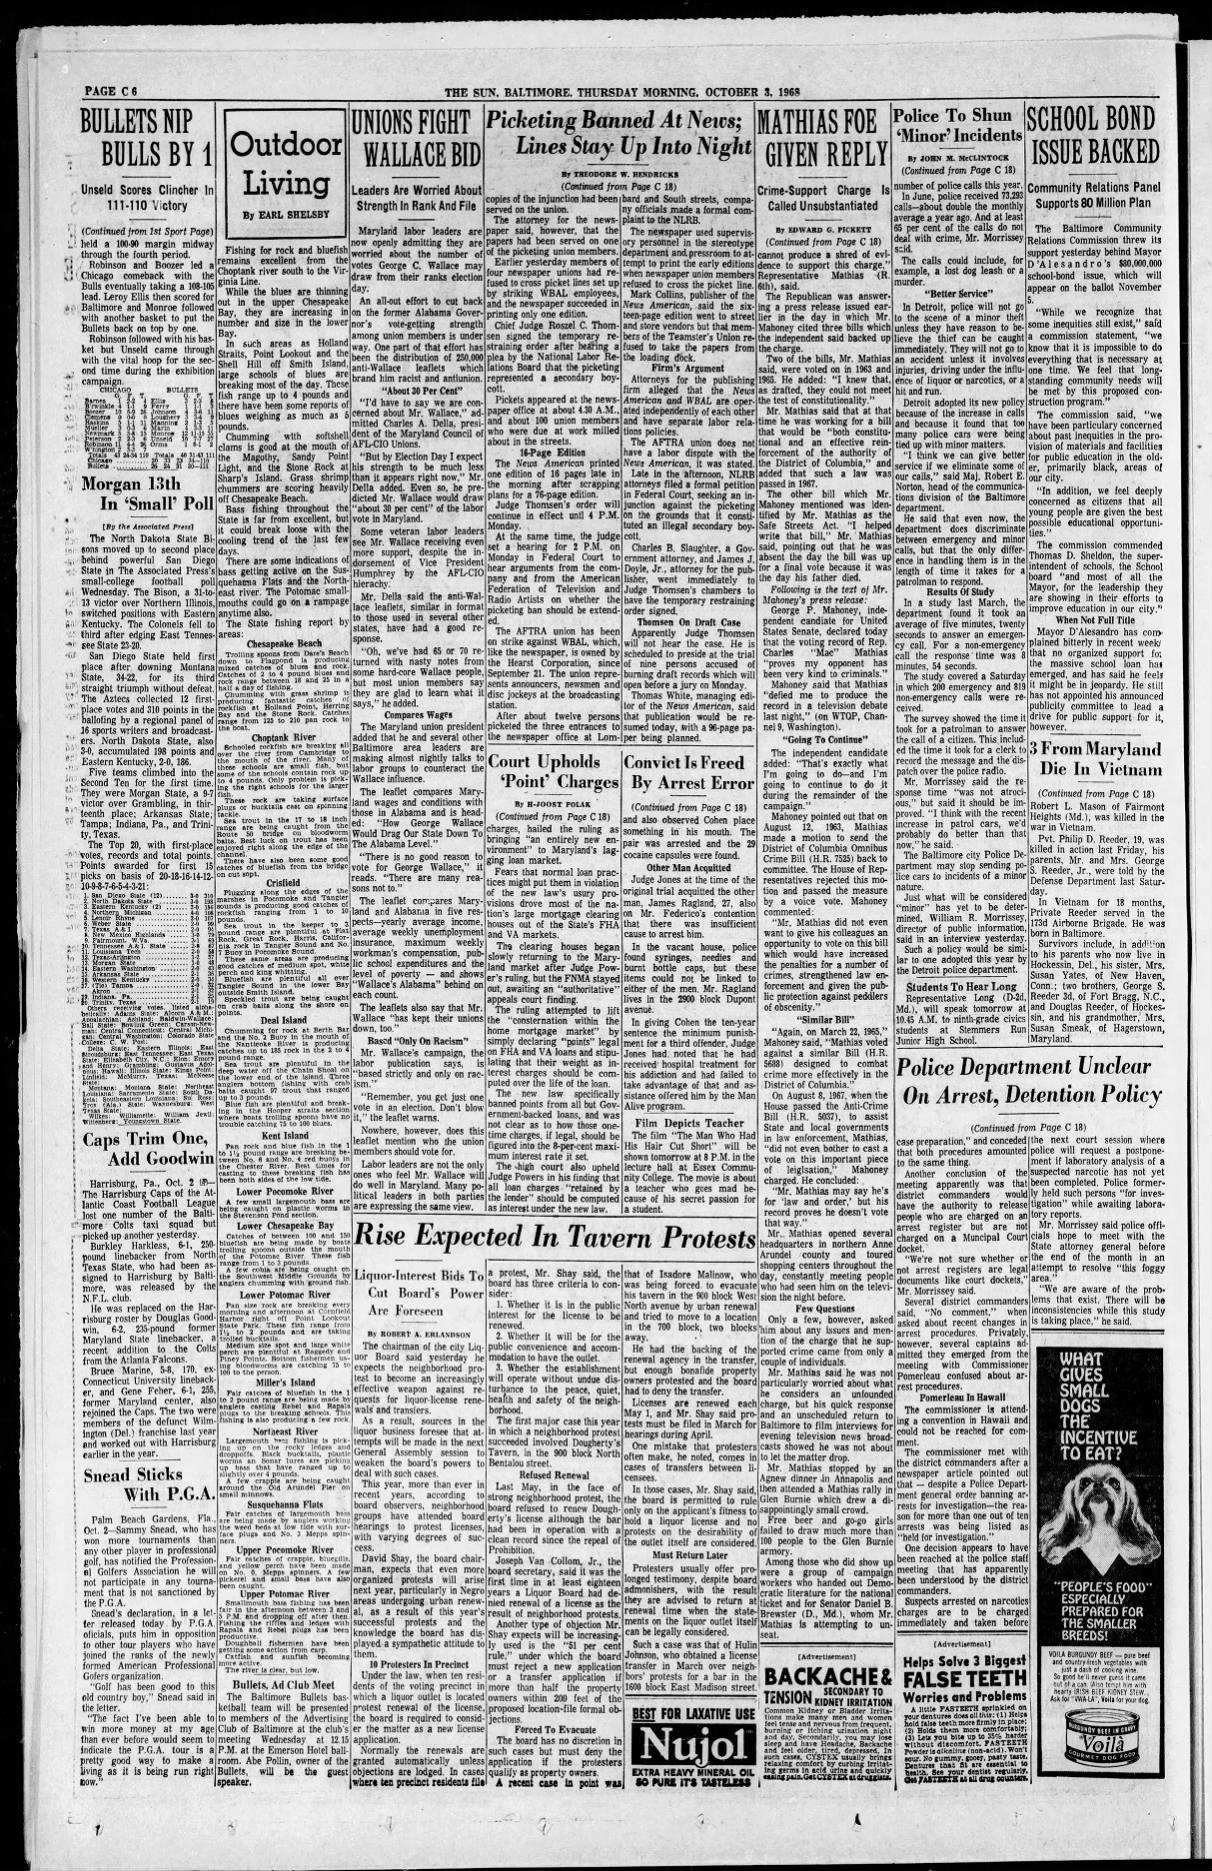 1968_Oct_3___George_M_Cox_Killed___full_spread_page_2.jpg